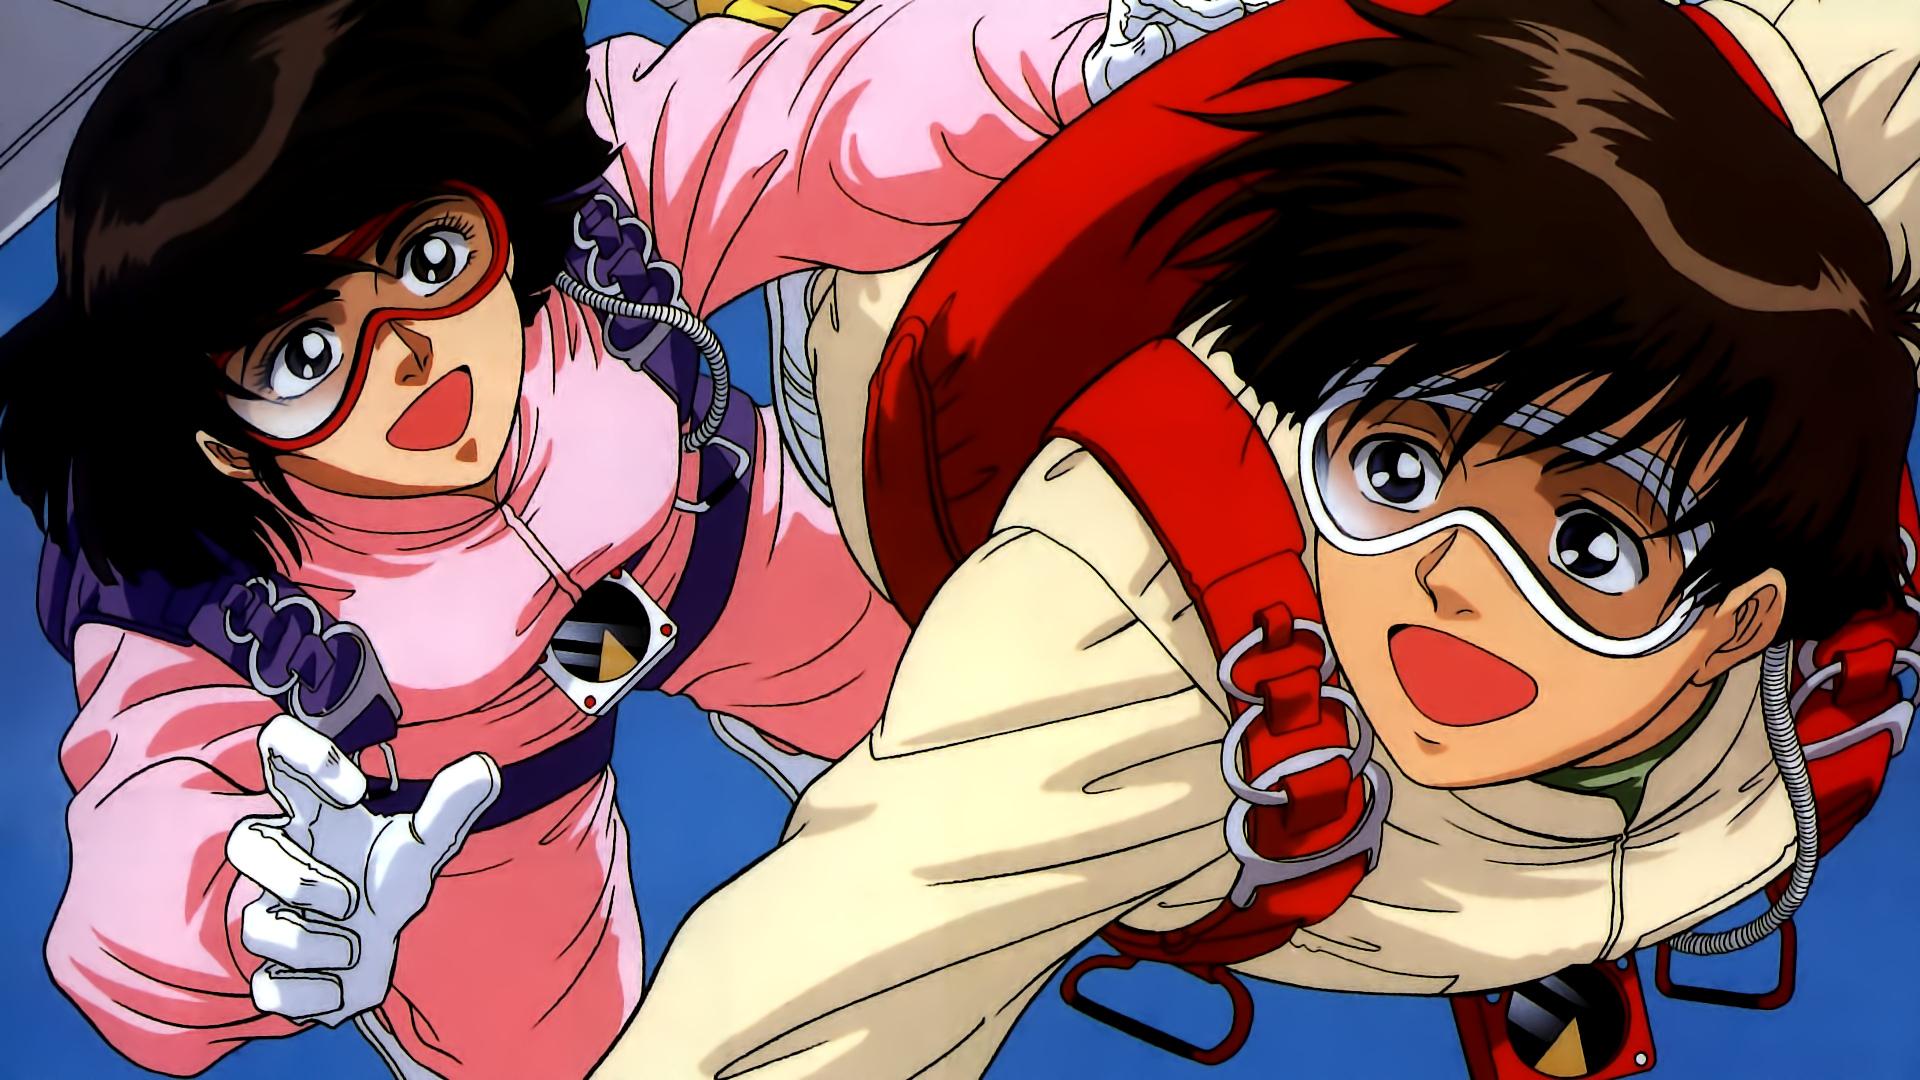 Kết quả hình ảnh cho Musekinin Kanchou Tylor (The Irresponsible Captain Tylor) anime